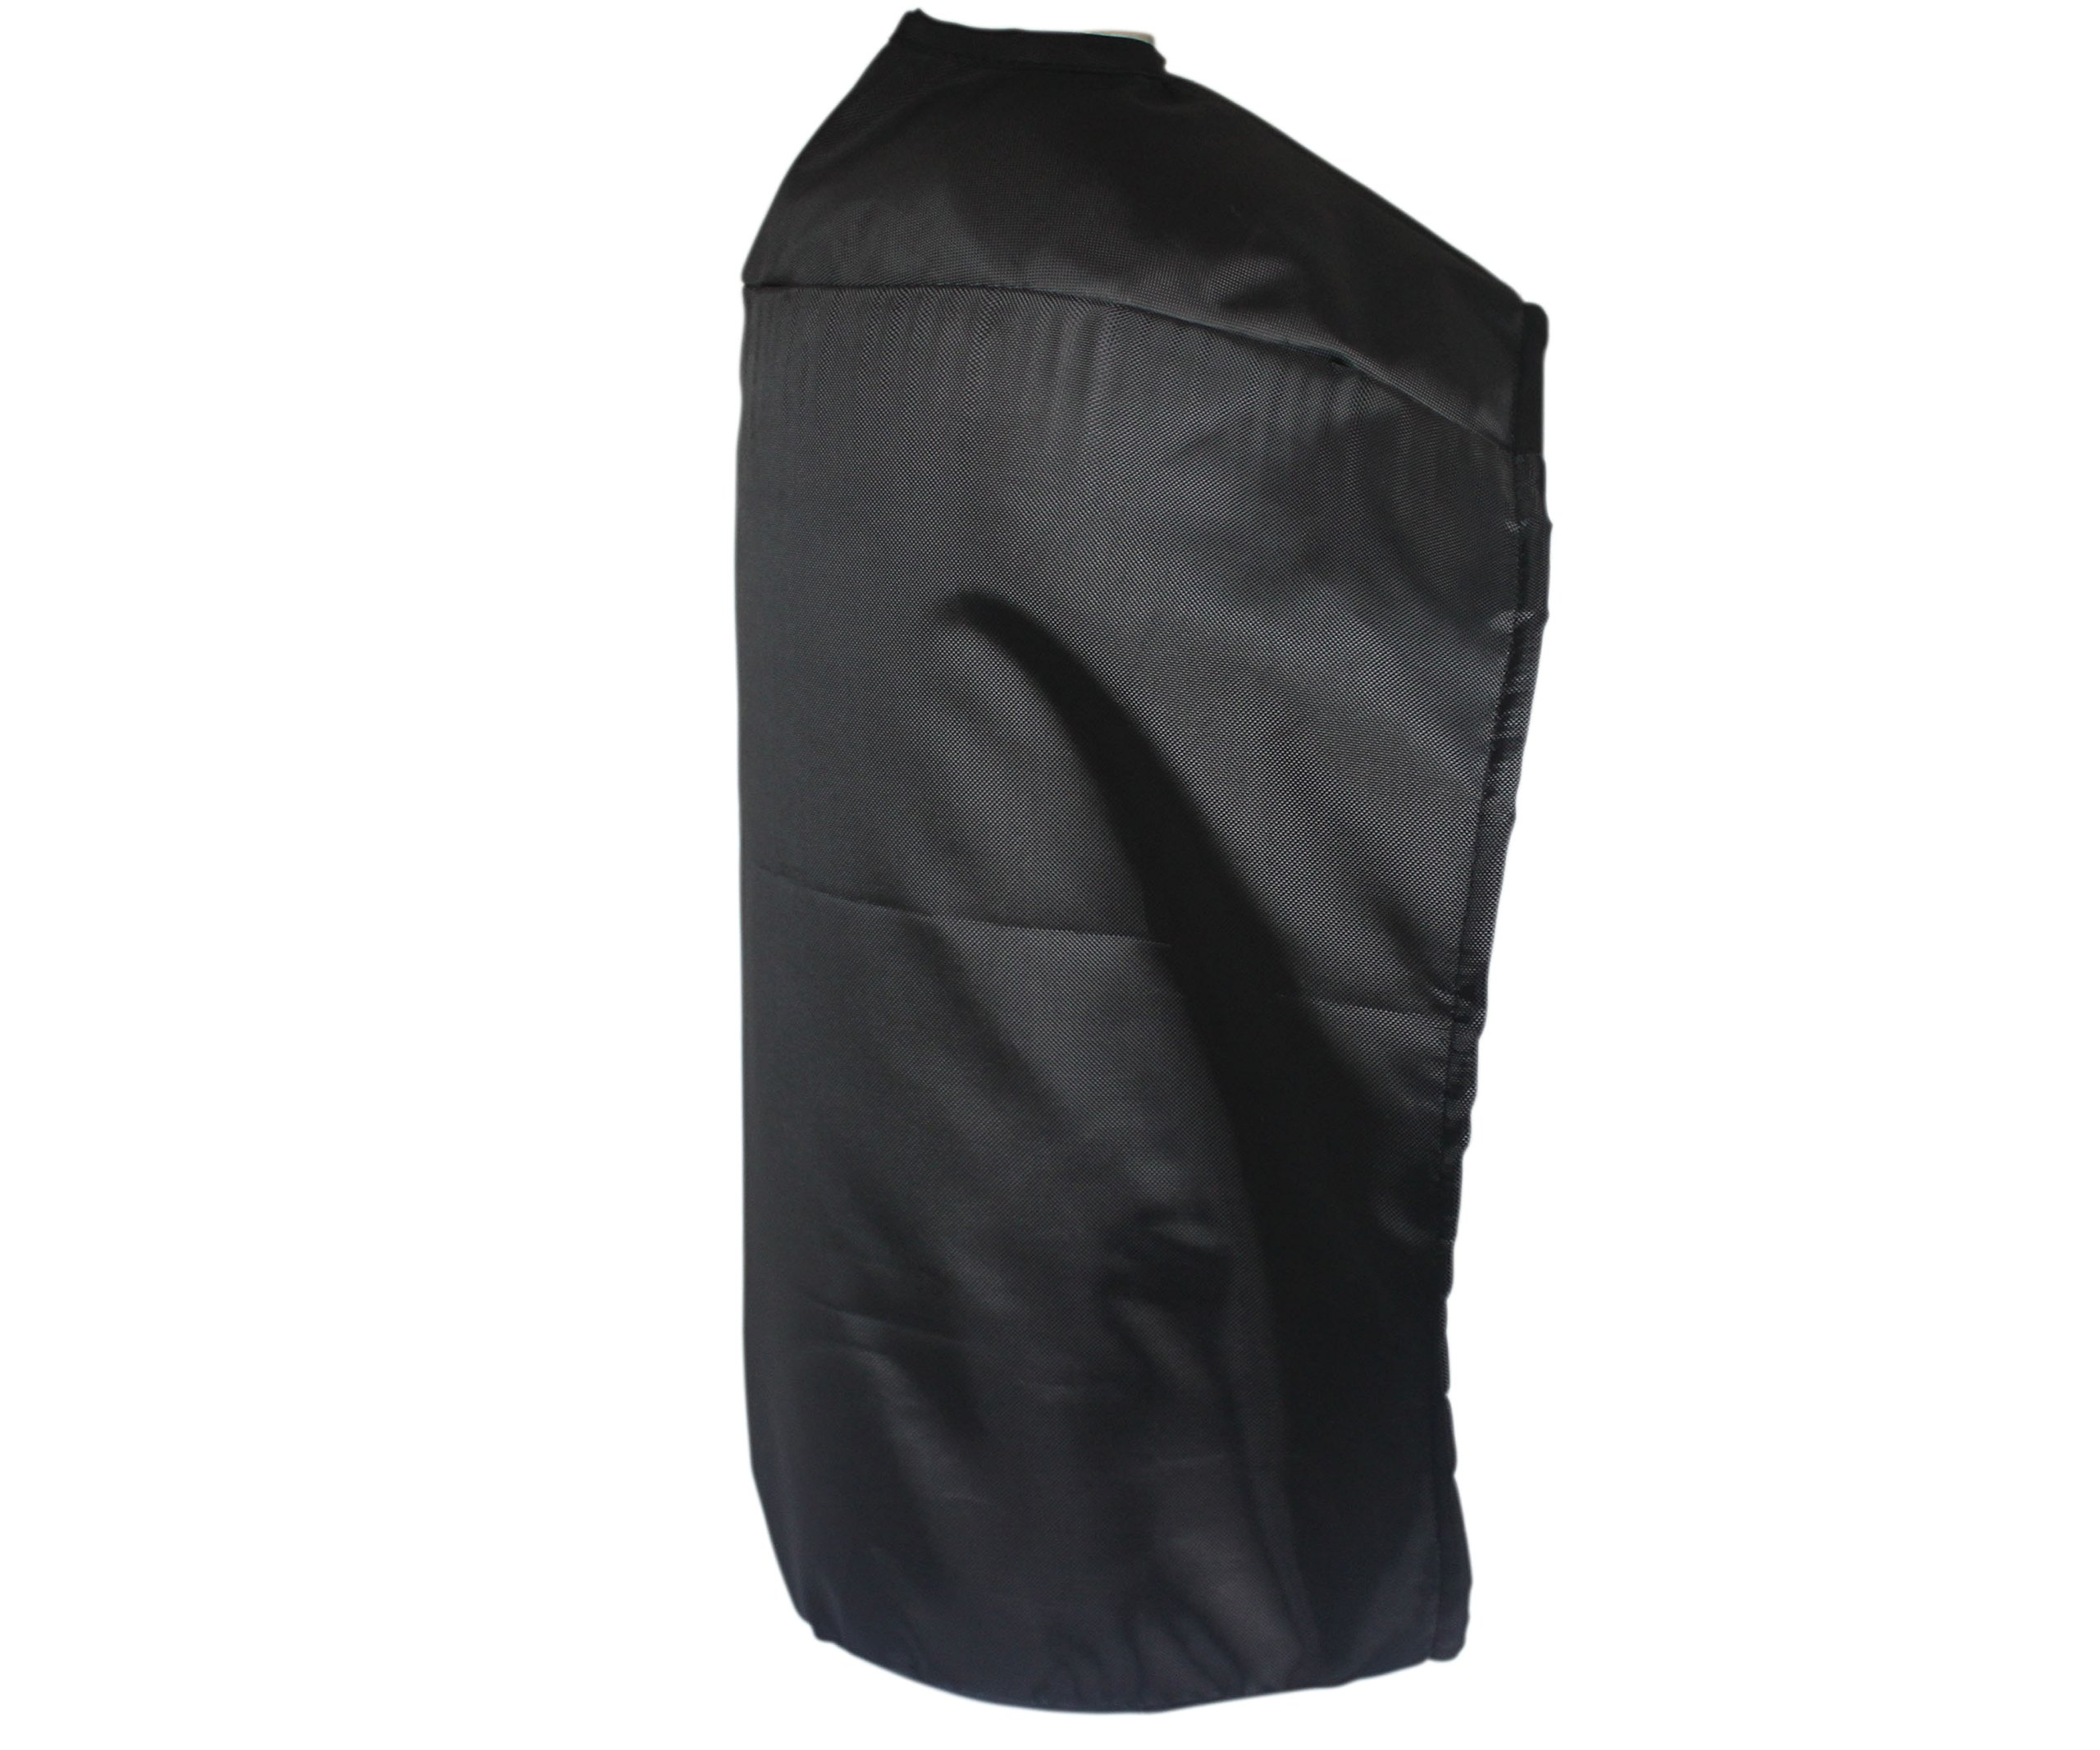 Dracary Nitrous Outlet Nitrous Bottle Blanket for 10 lb